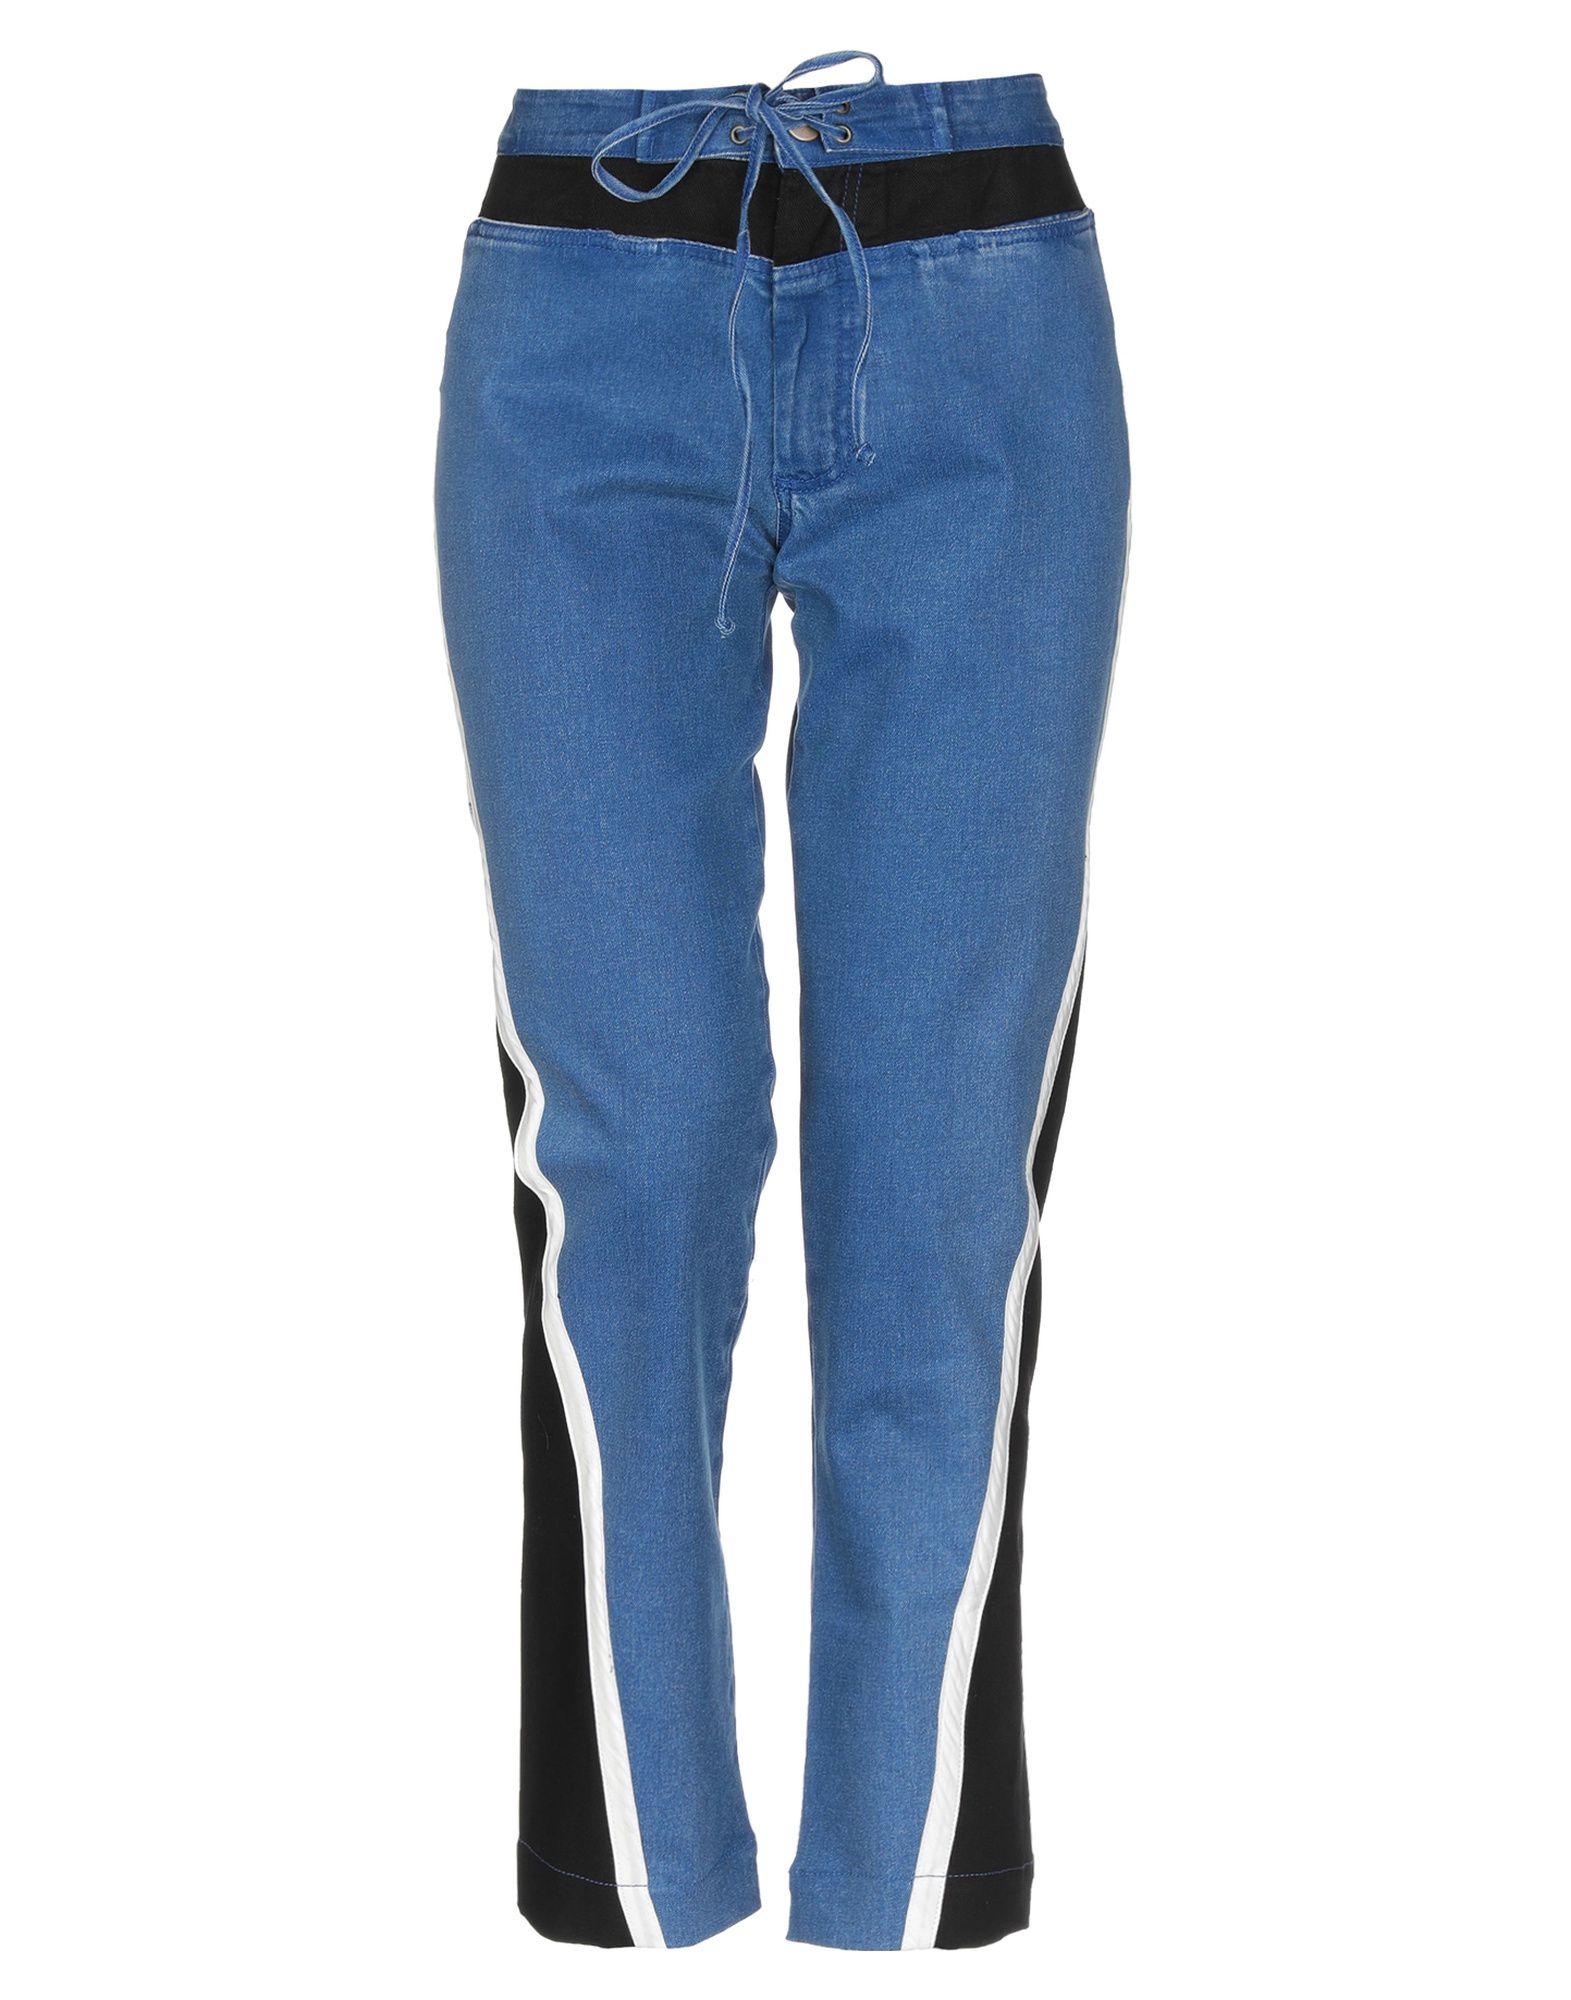 AMPERSAND HEART New York Джинсовые брюки ampersand heart new york джинсовая юбка